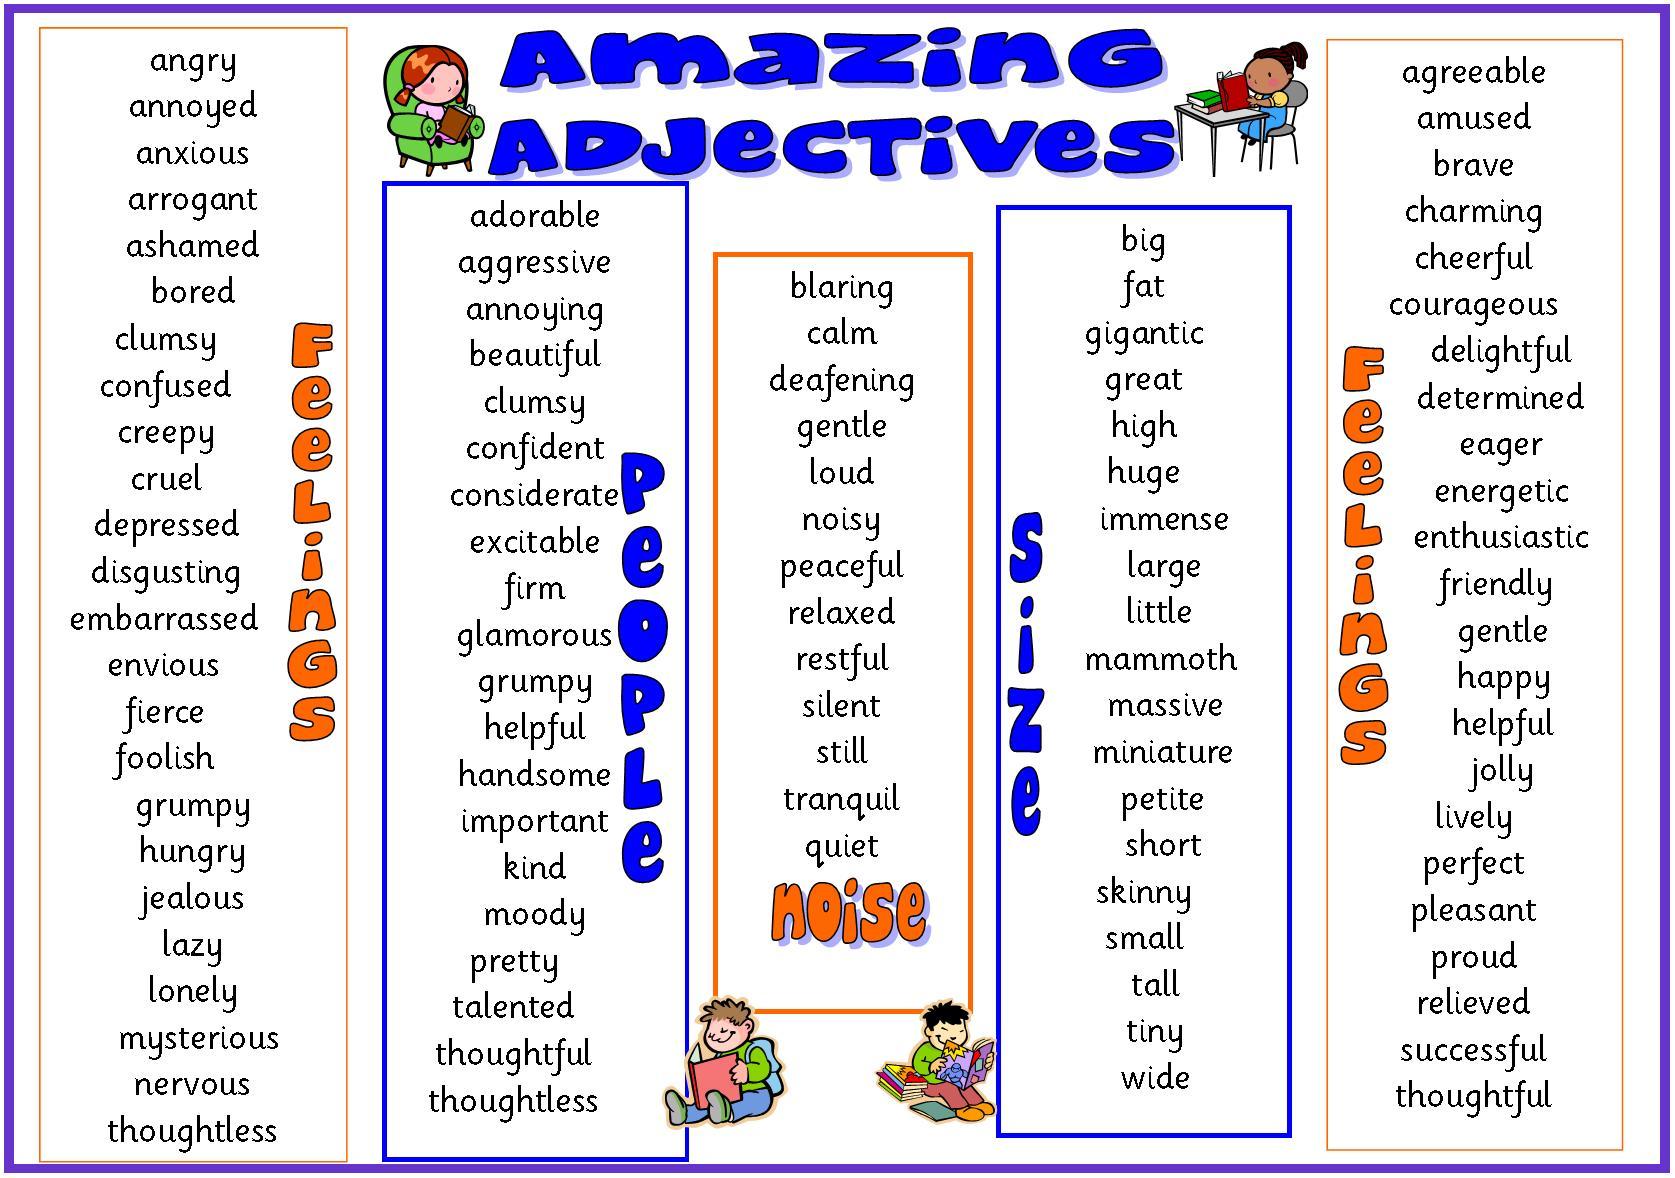 Adjectives Adverbs Comparison